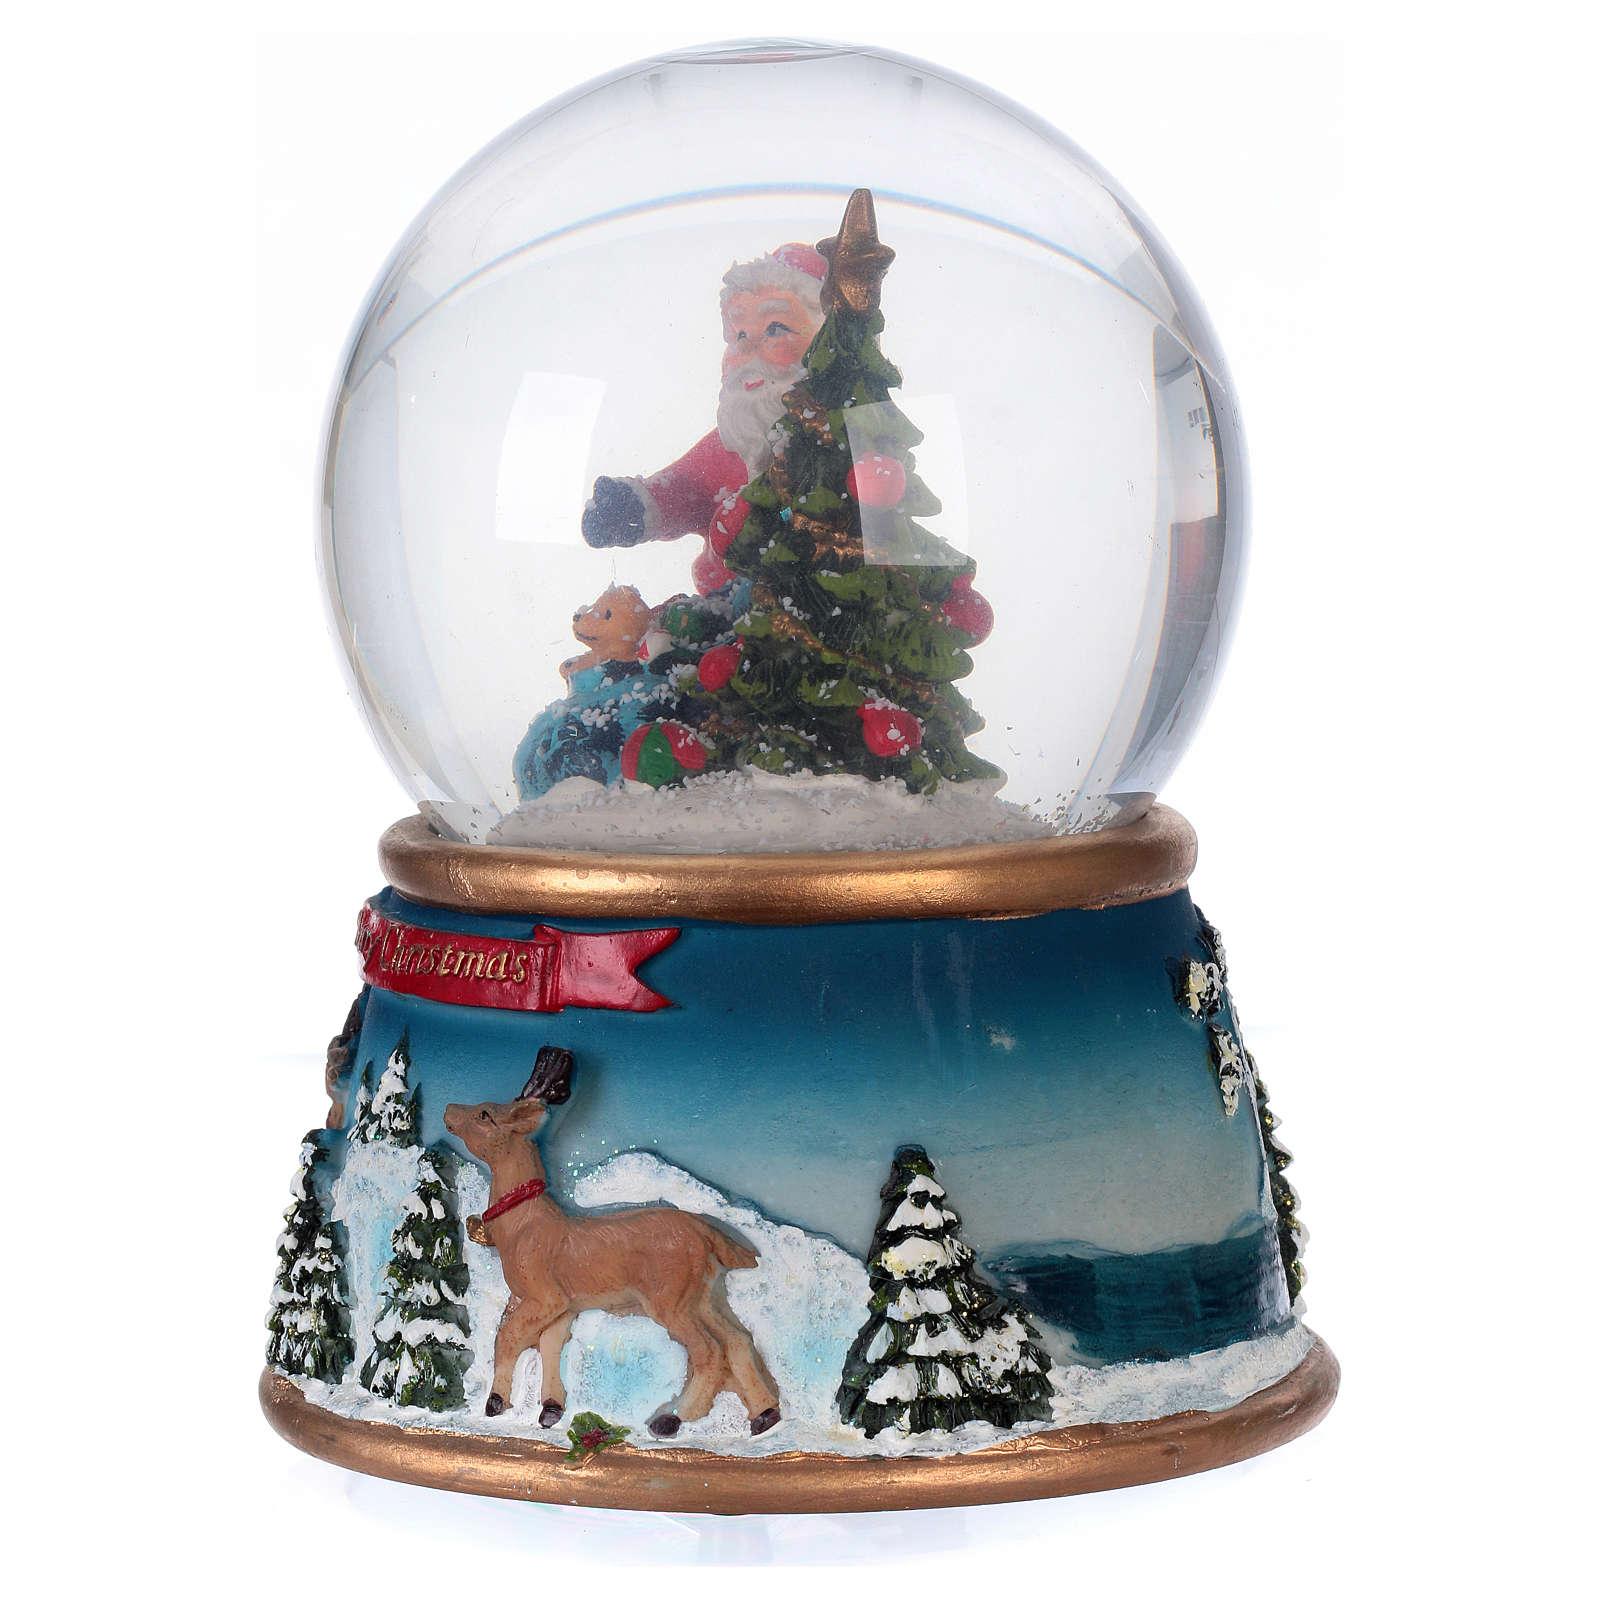 Globo de neve vidro Pai Natal Merry Christmas música e glitter 3